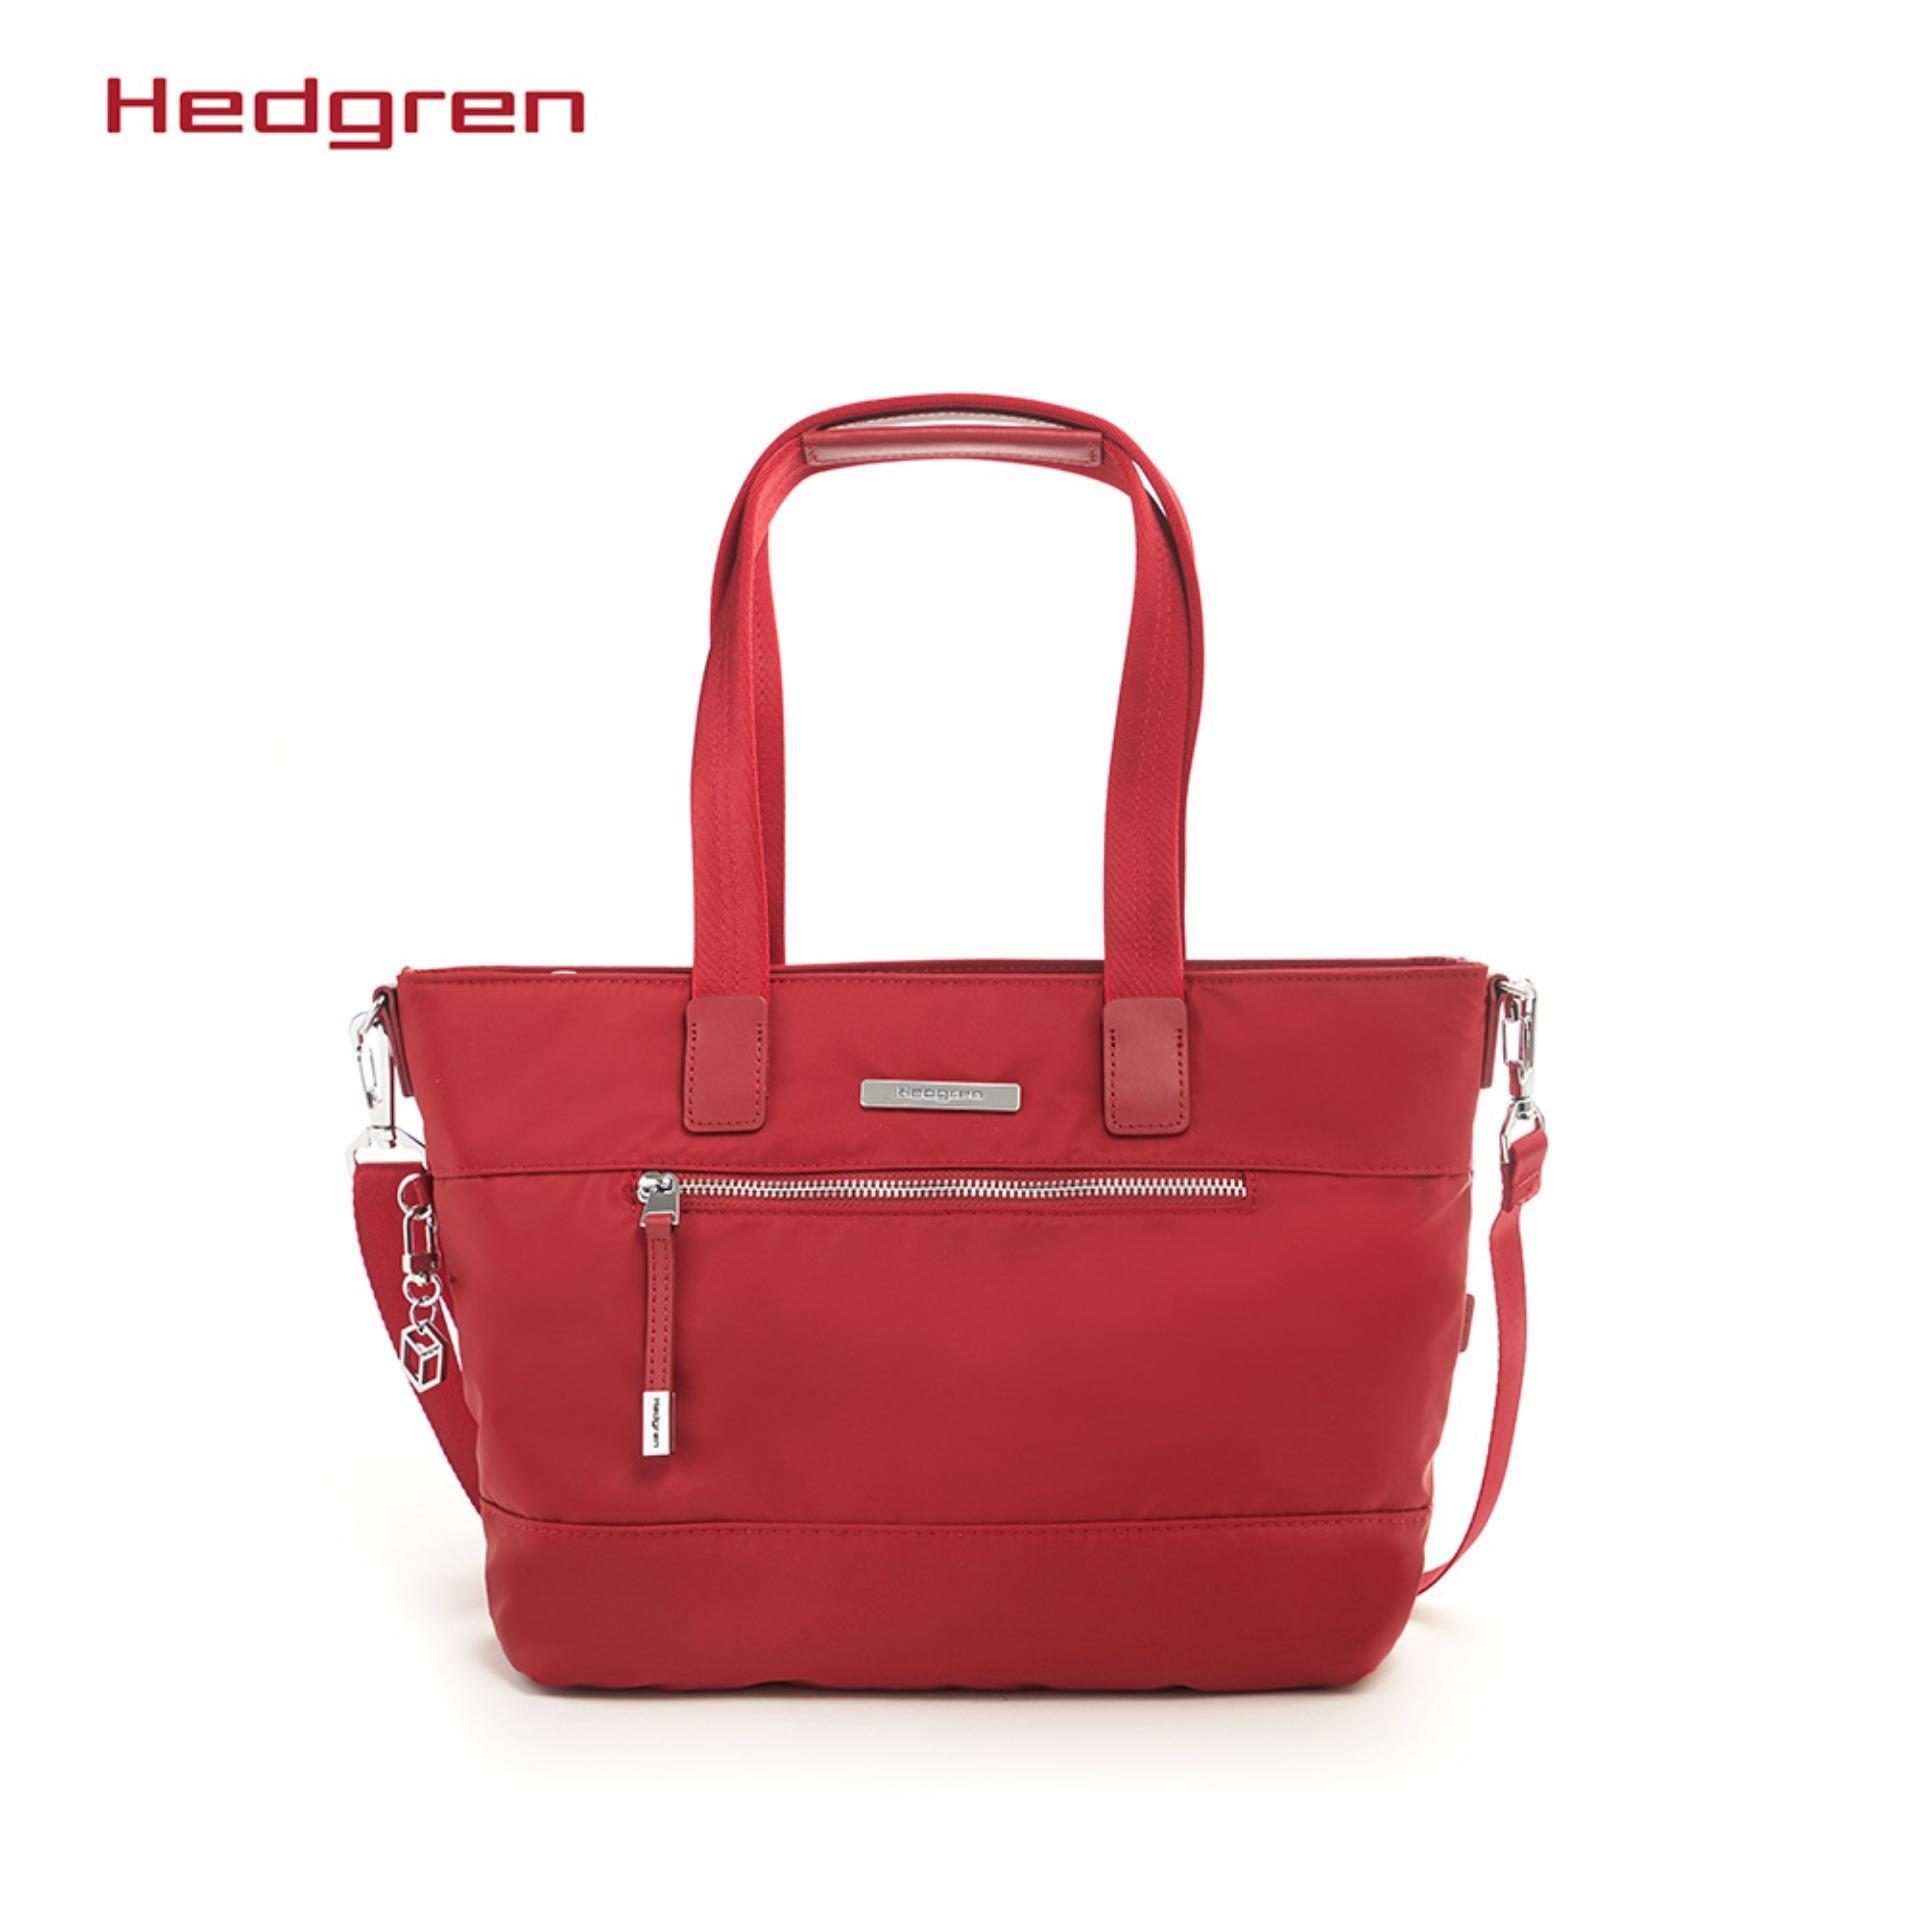 Hedgren Glaze Women S Nylon Tote Bag